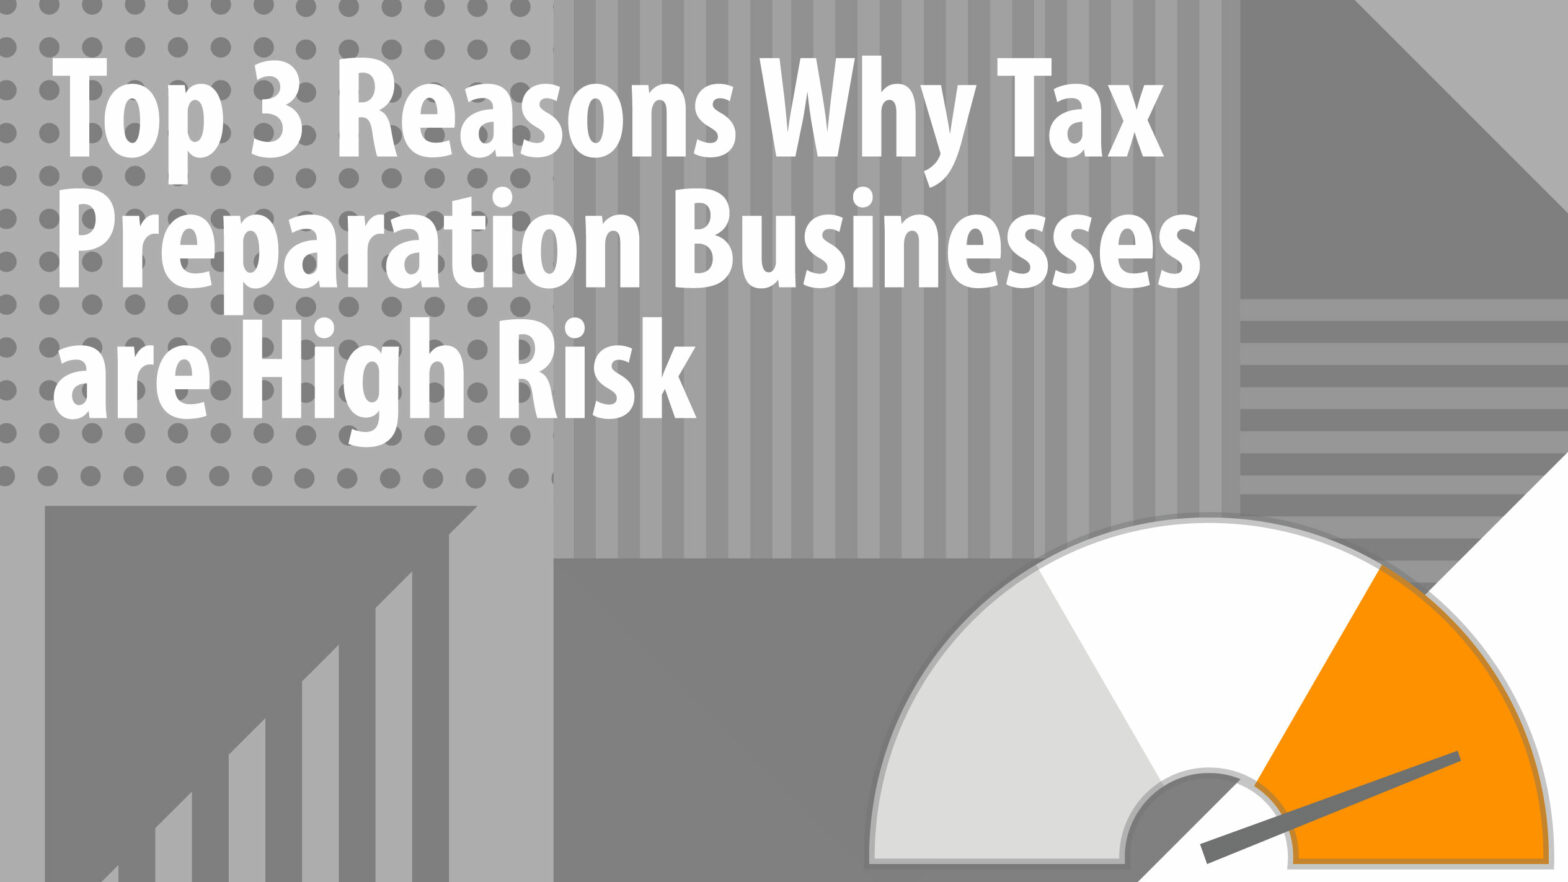 Tax Preparation High Risk Article Header